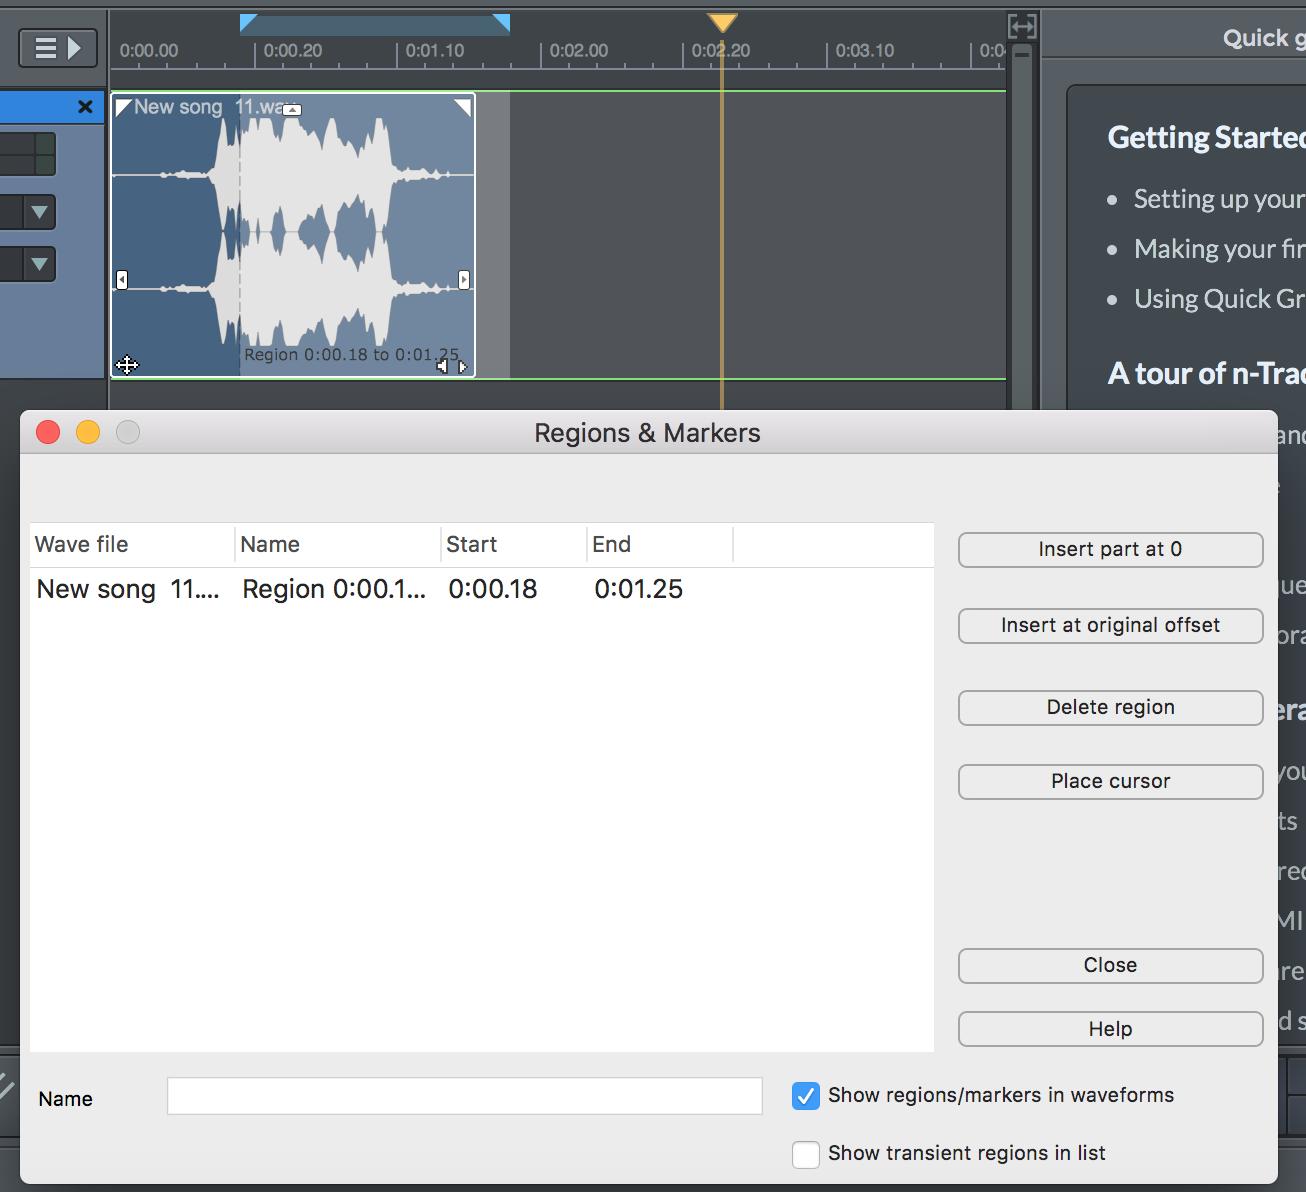 codigo de registro de switch sound file converter plus